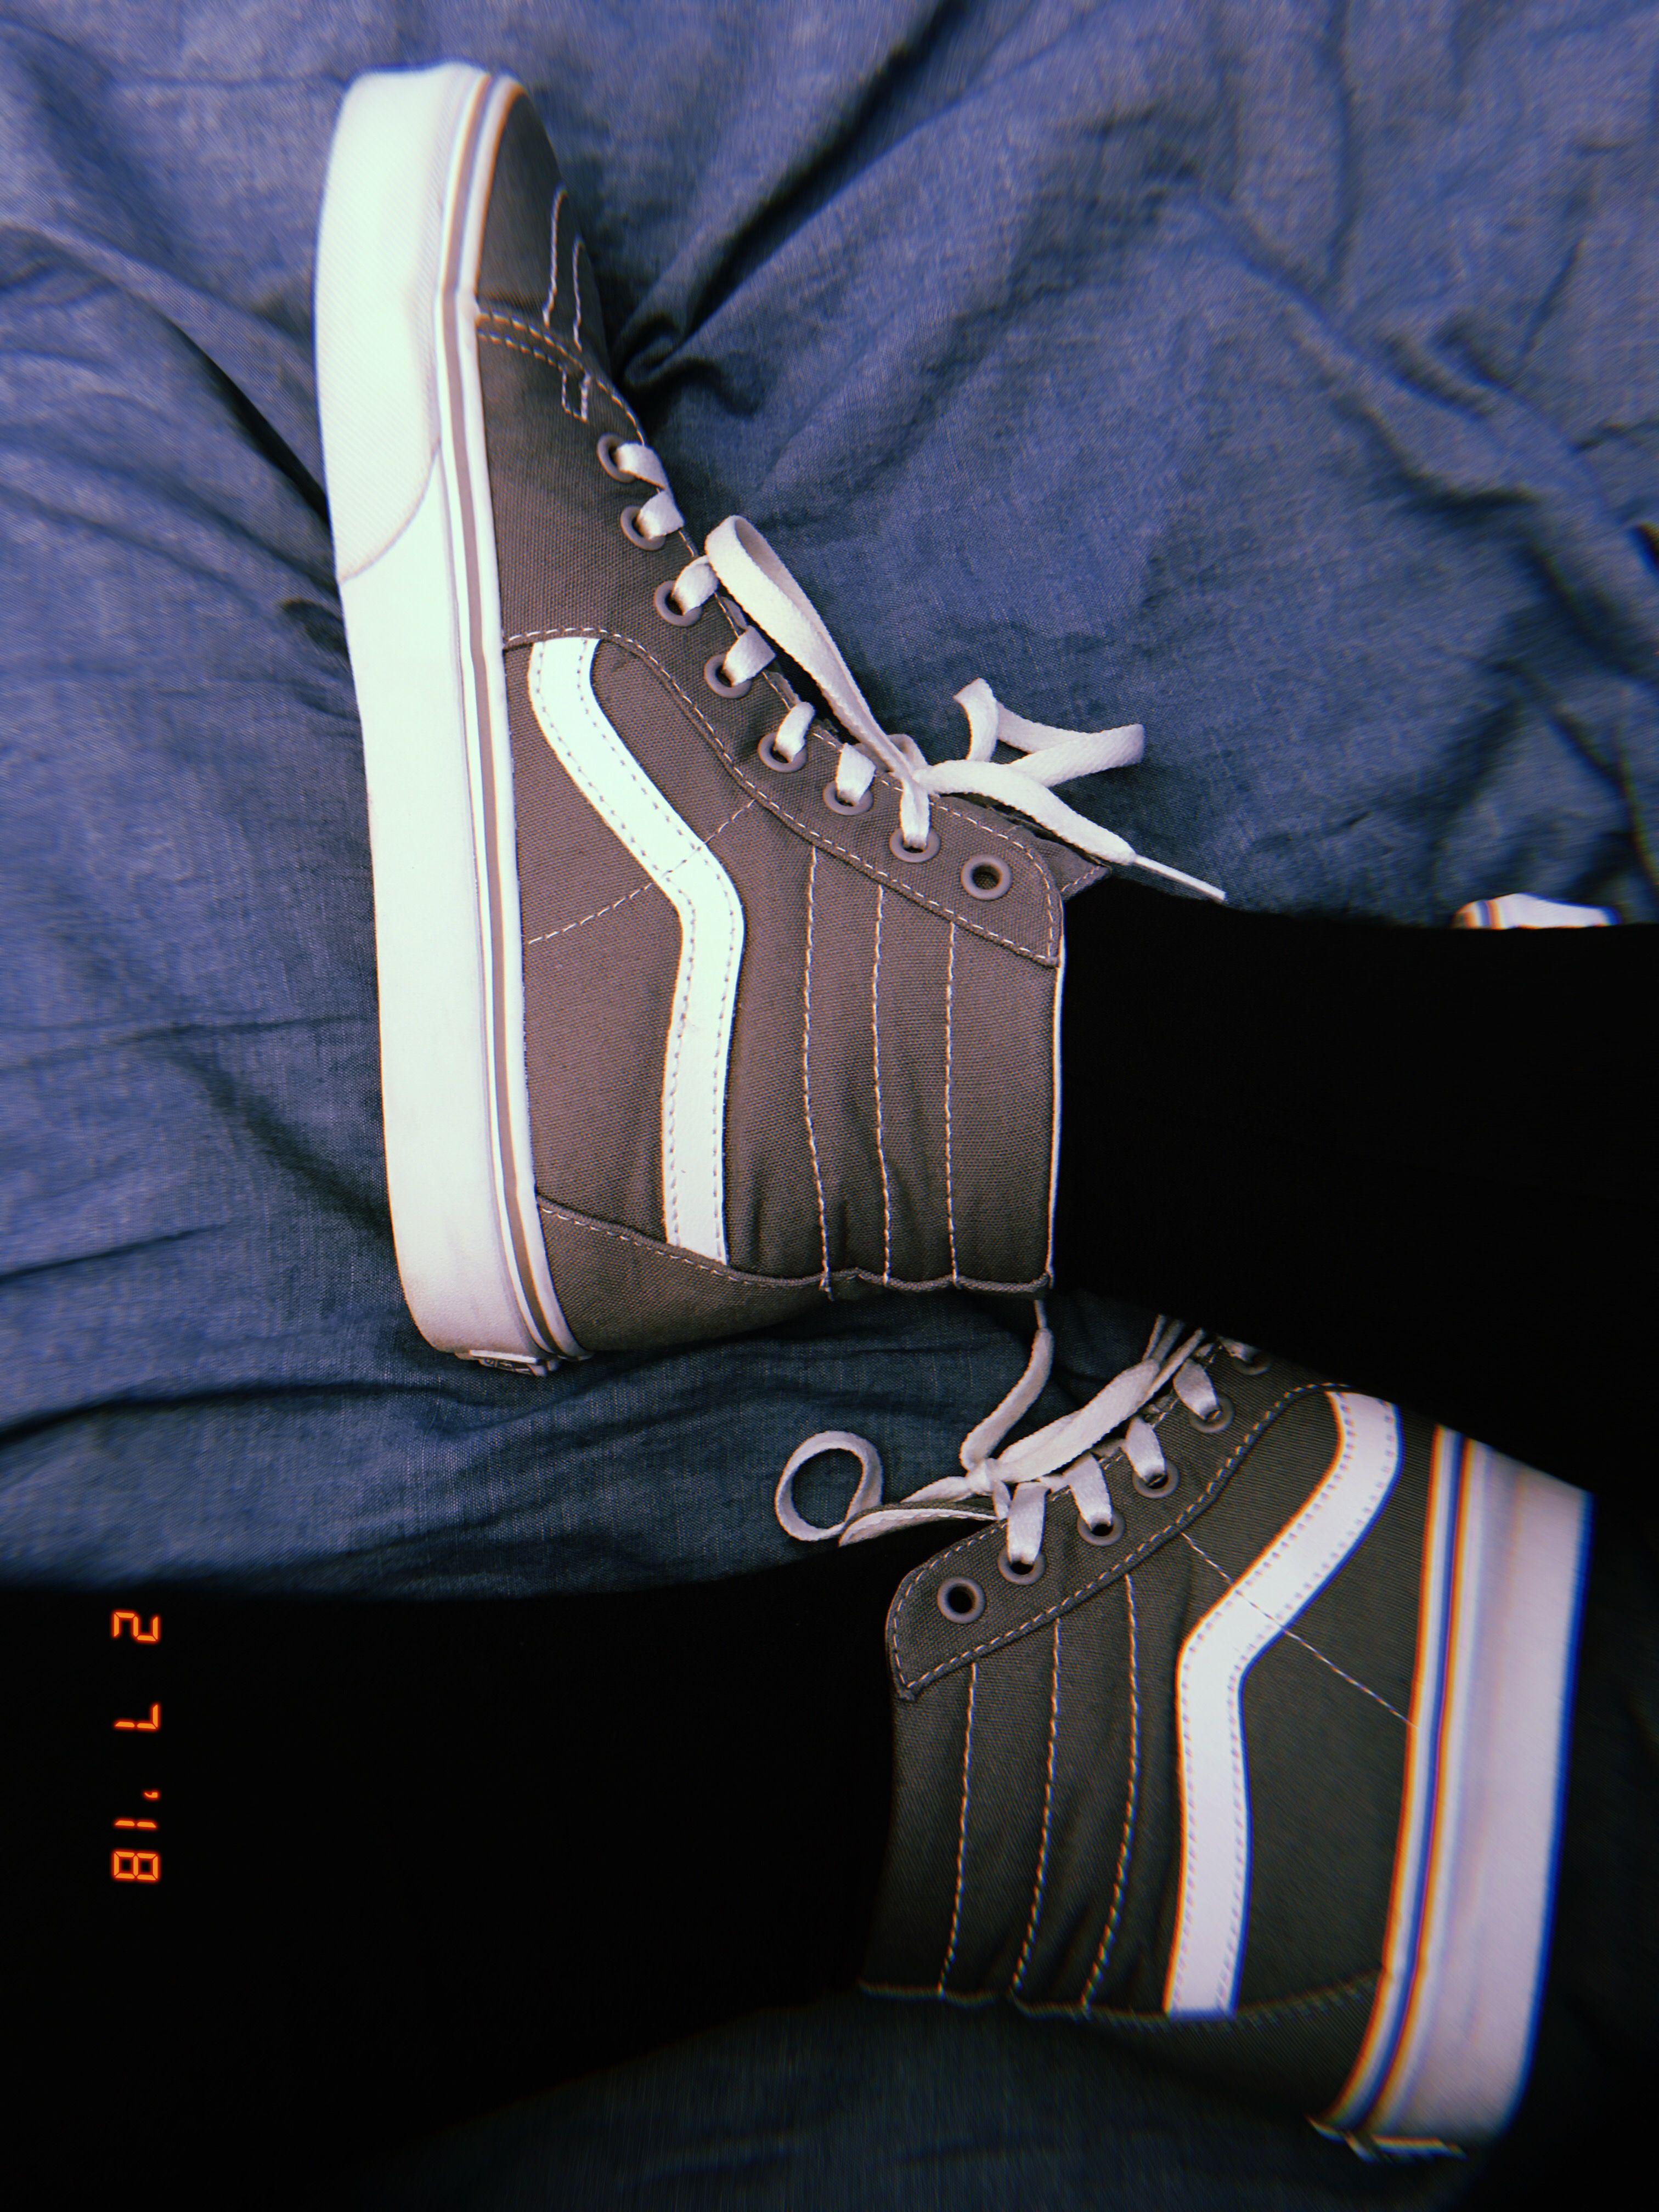 90ff811fcc05d6 gray grey vans - high tops - jeans - aesthetic - photography - tumblr -  blue - retro - huji - teen angst - sk8r boi